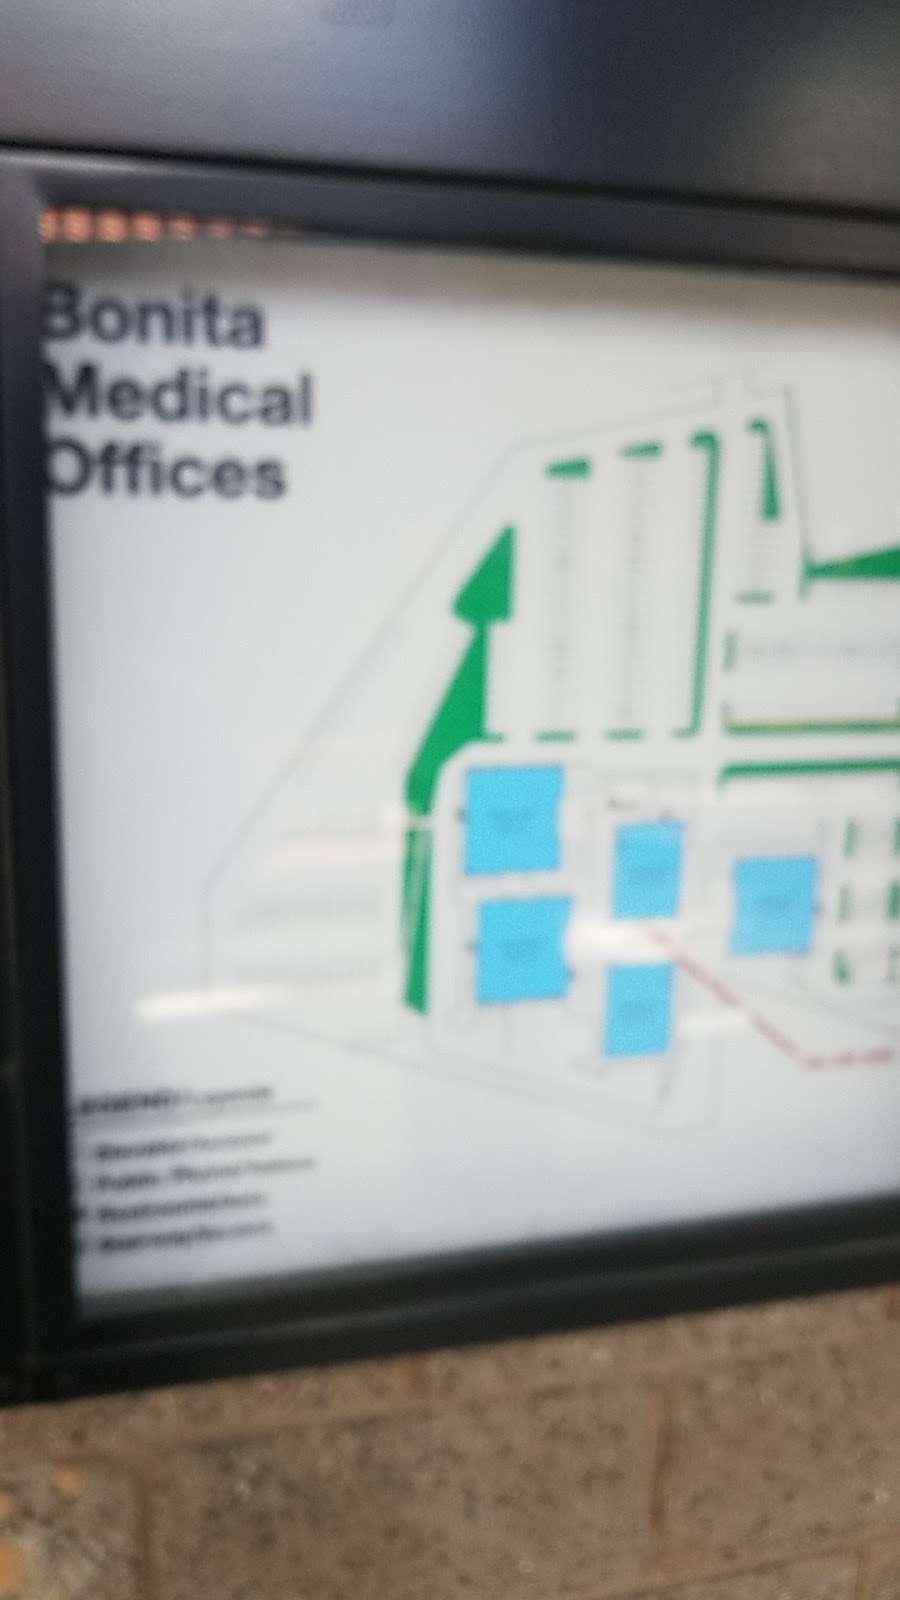 Kaiser Permanente Medical Offices - hospital  | Photo 6 of 10 | Address: 3955 Bonita Rd, Bonita, CA 91902, USA | Phone: (833) 574-2273